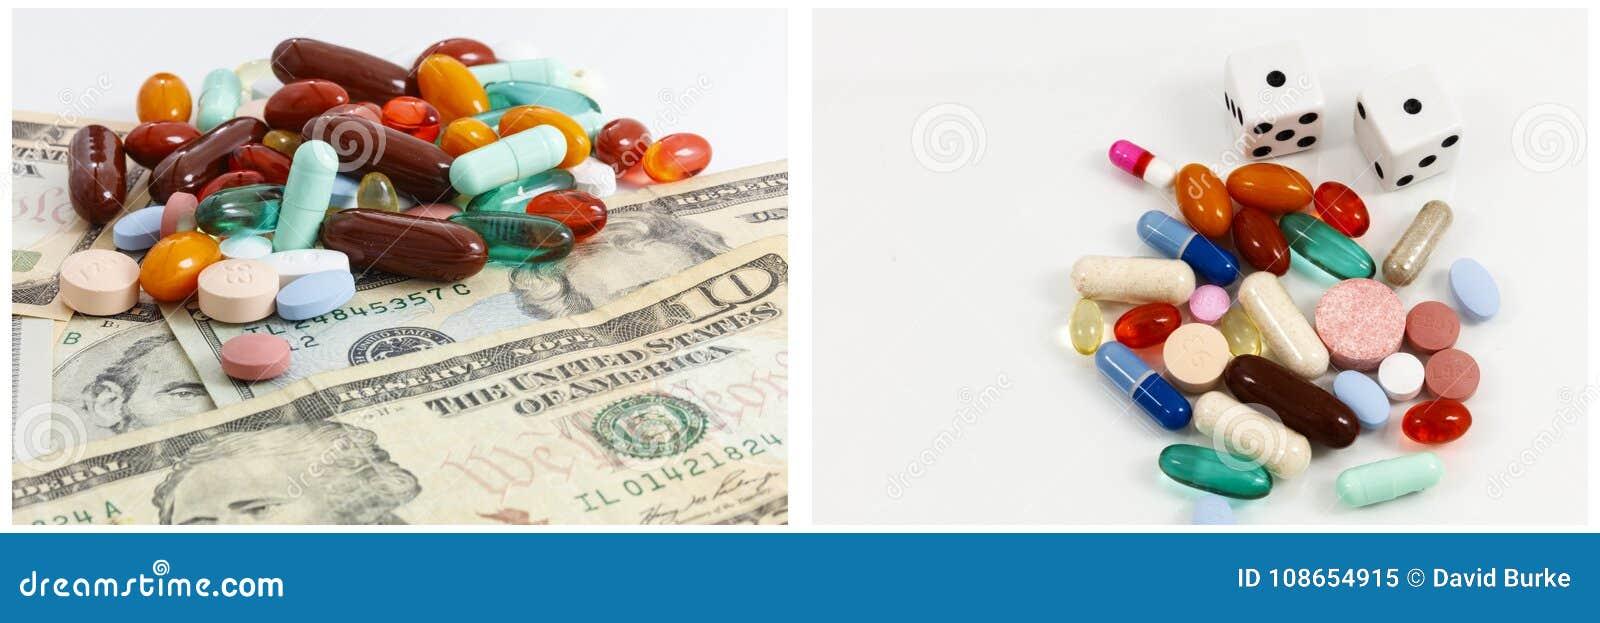 Money Prescription Drugs Gambling Collage Stock Image